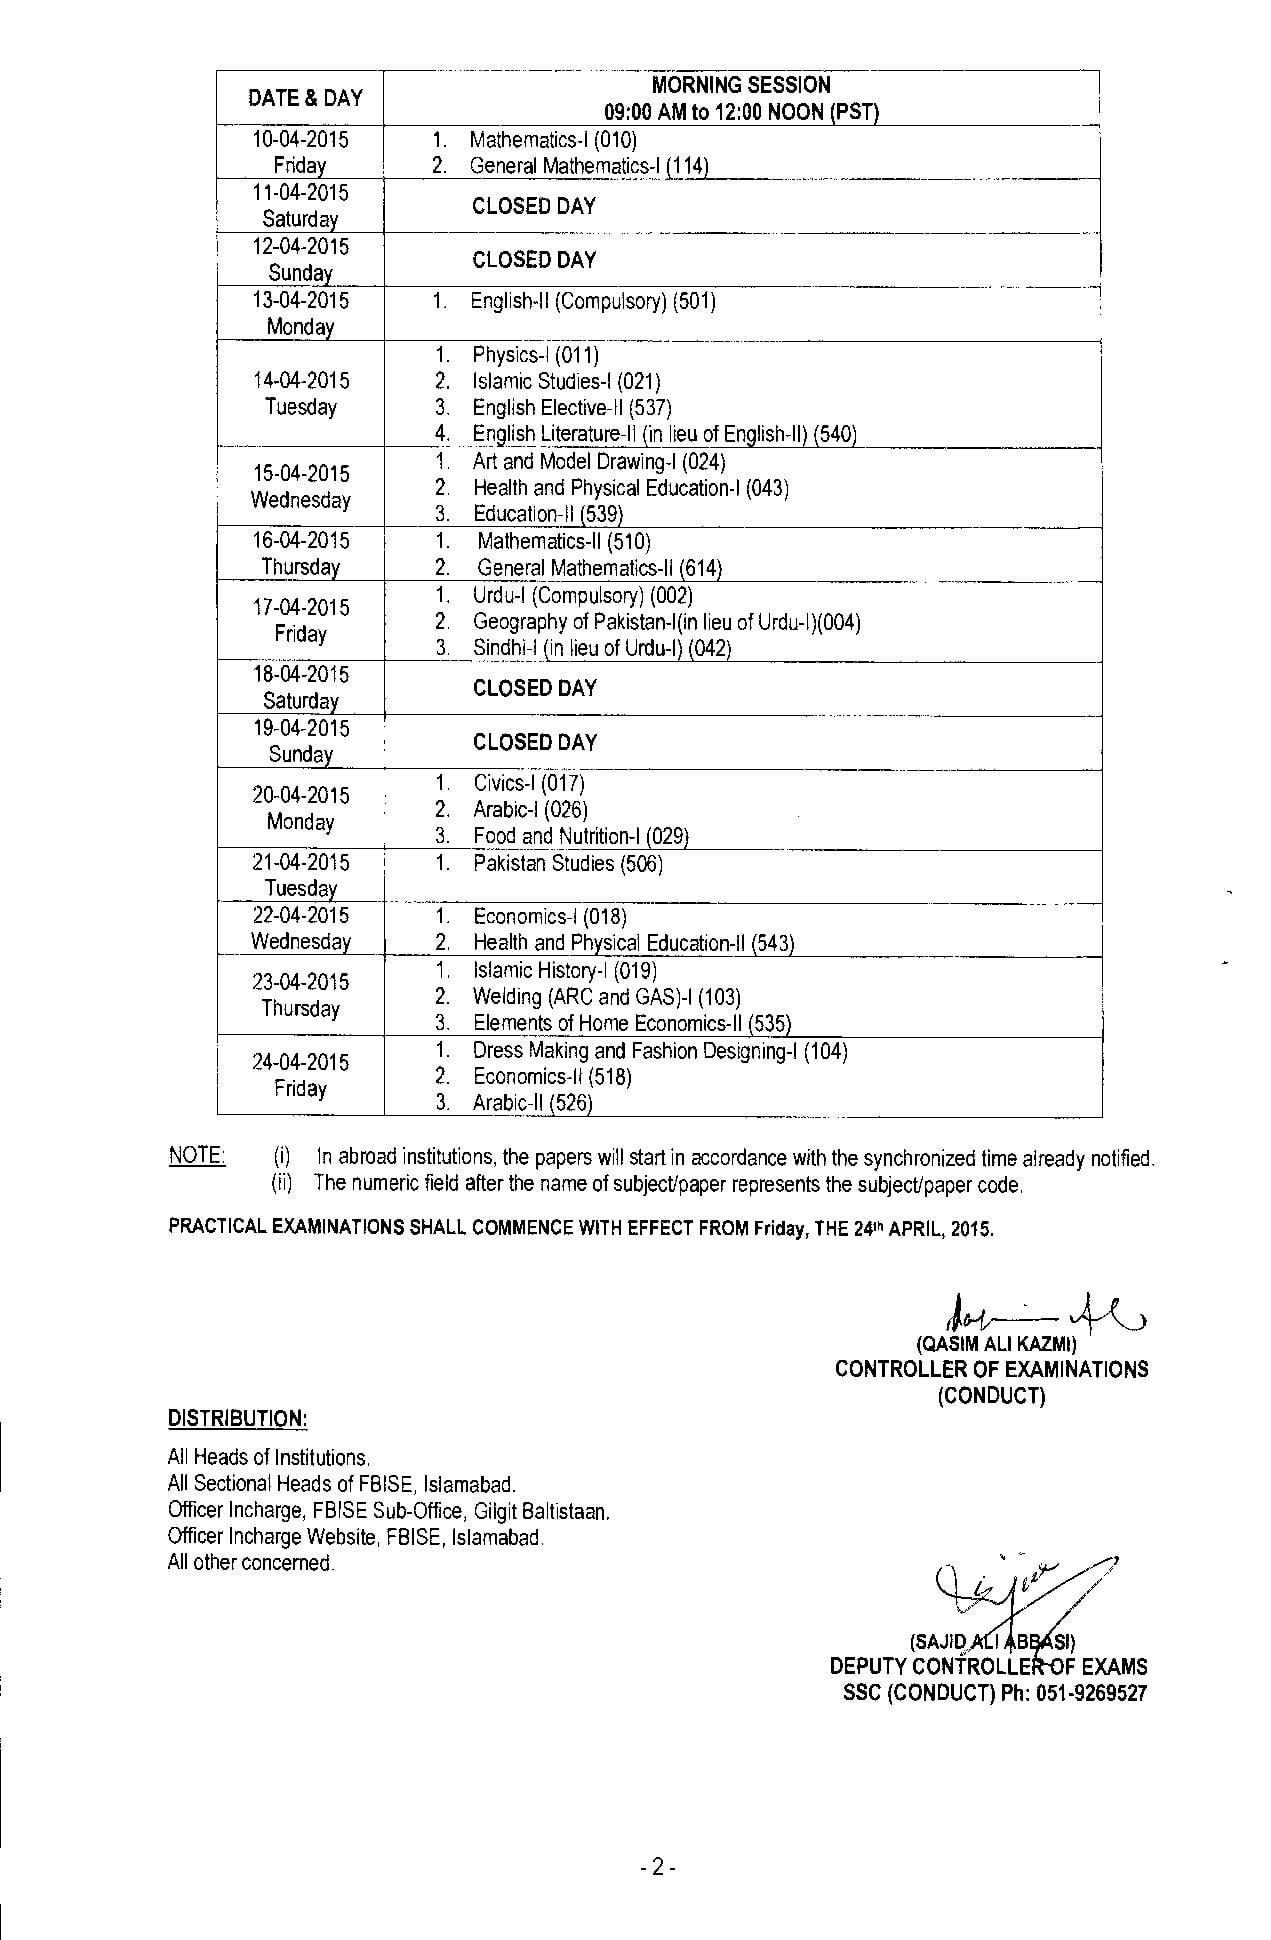 FBISE Federal Board Islamabad SSC Matric 9th 10th Class Annual